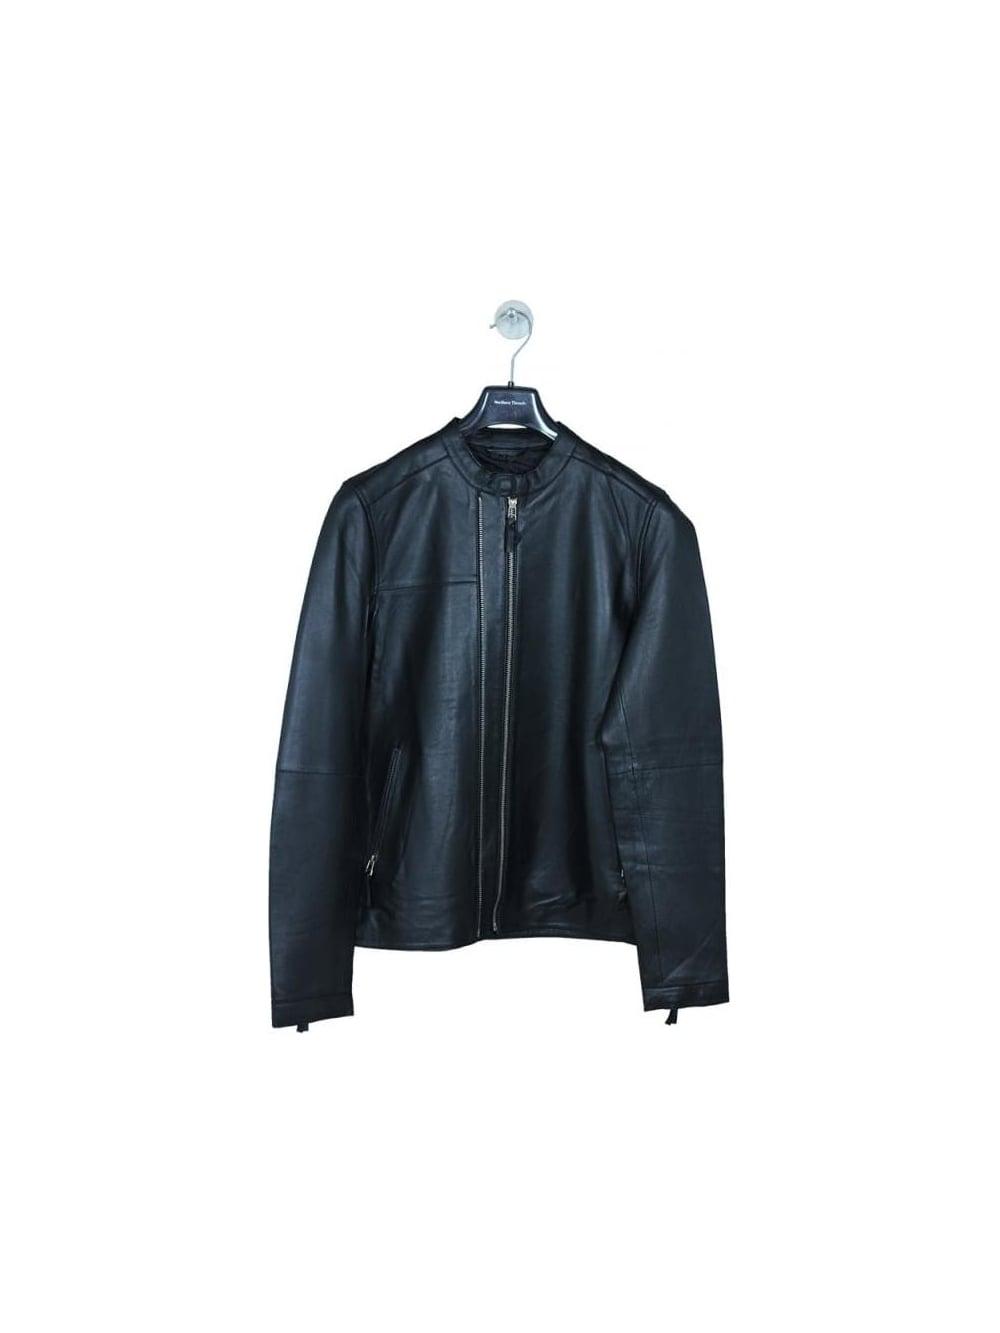 Pretty Green Addison Leather Biker Jacket in Black - Northern Threads 0ffa8792c8db